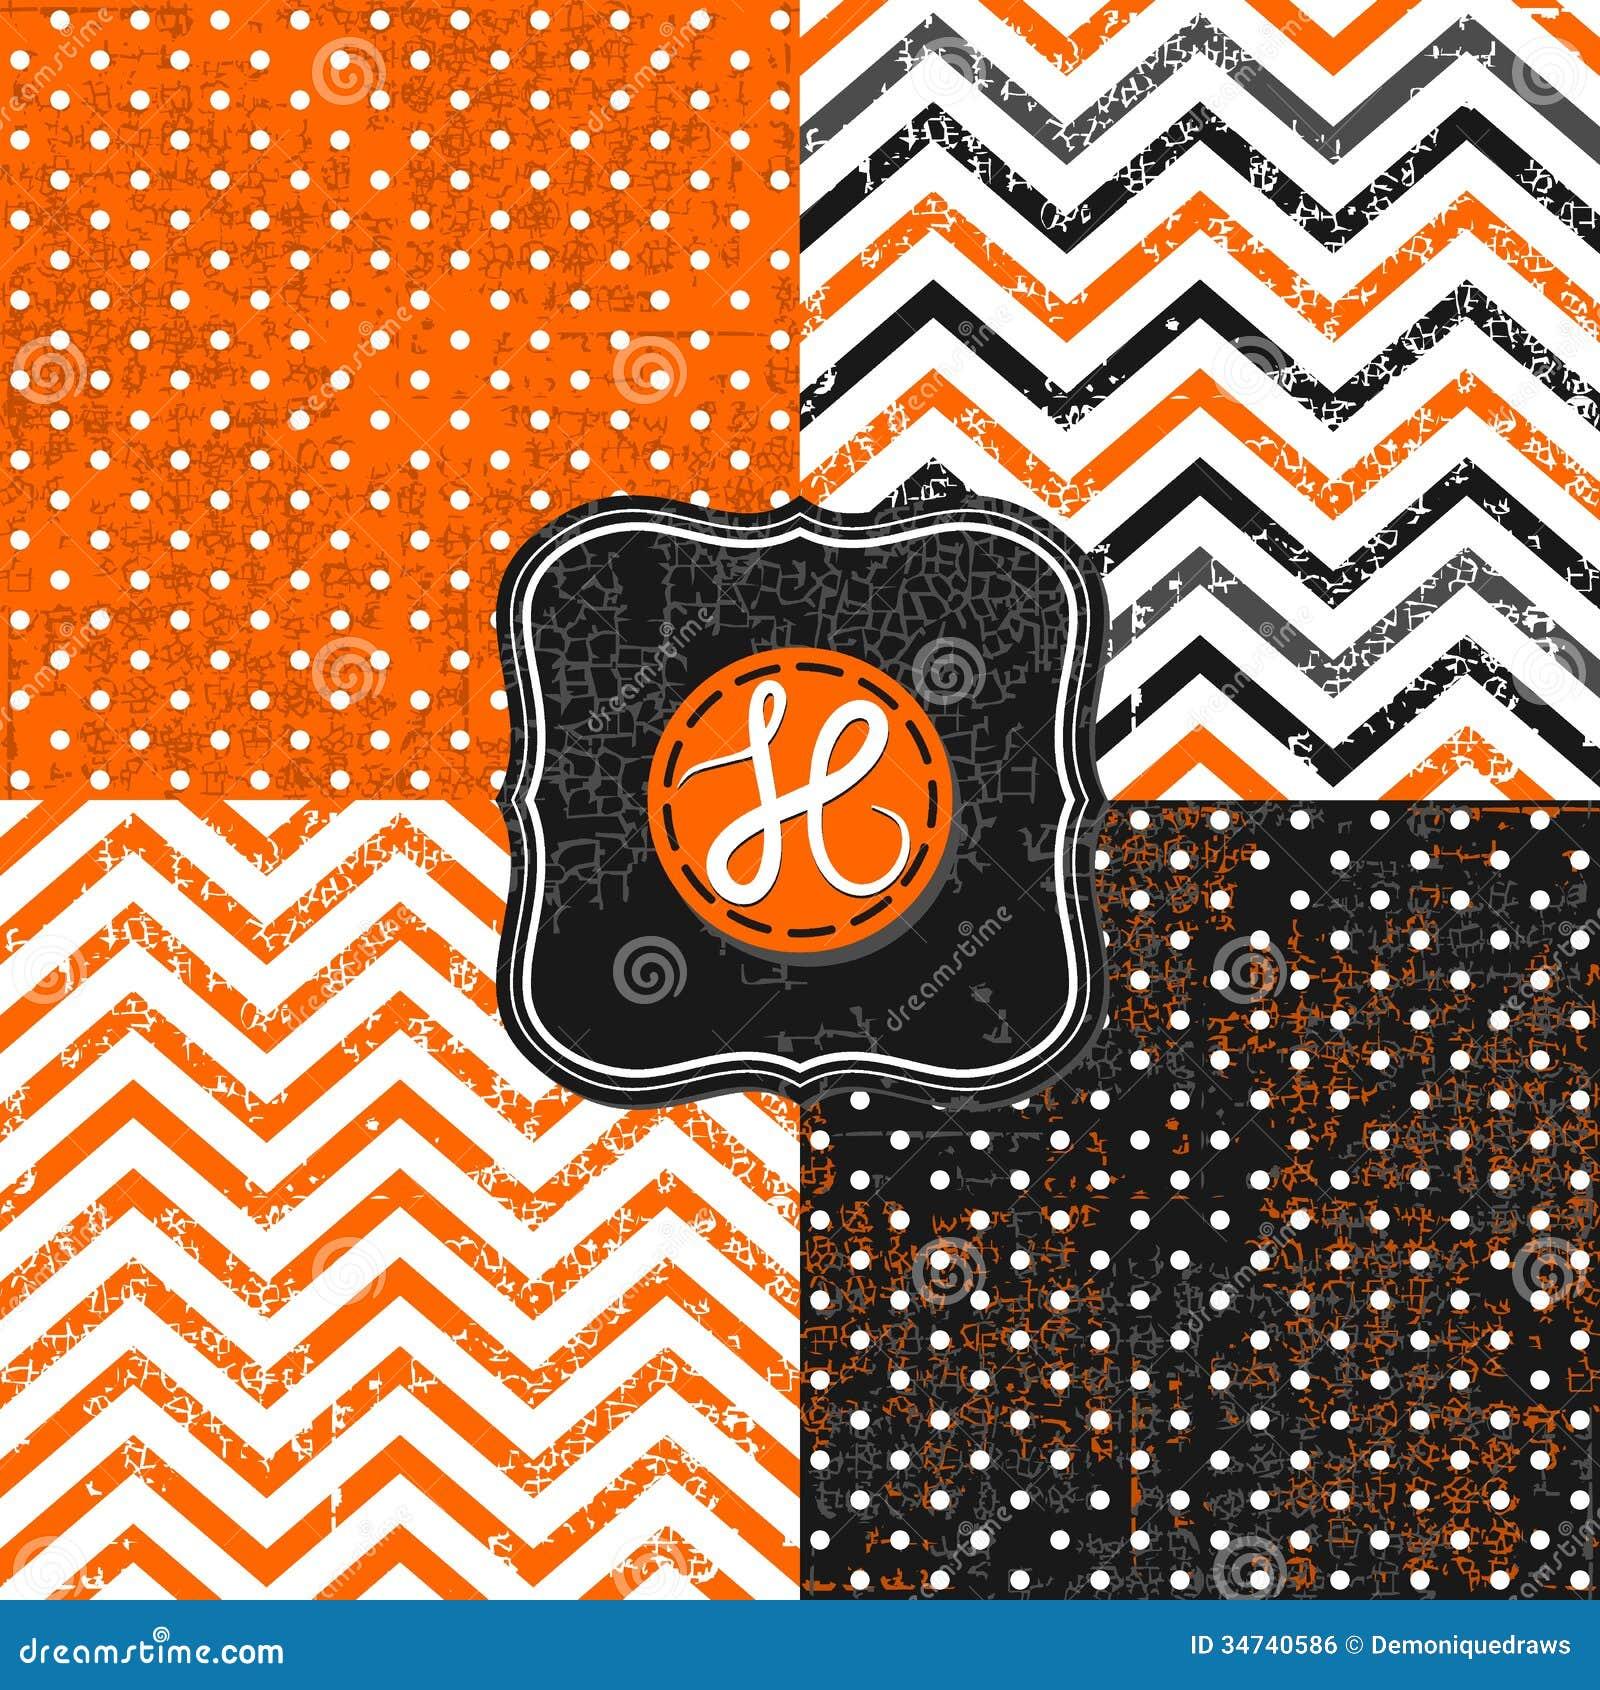 black chevron dots halloween little orange - Black And Orange Halloween